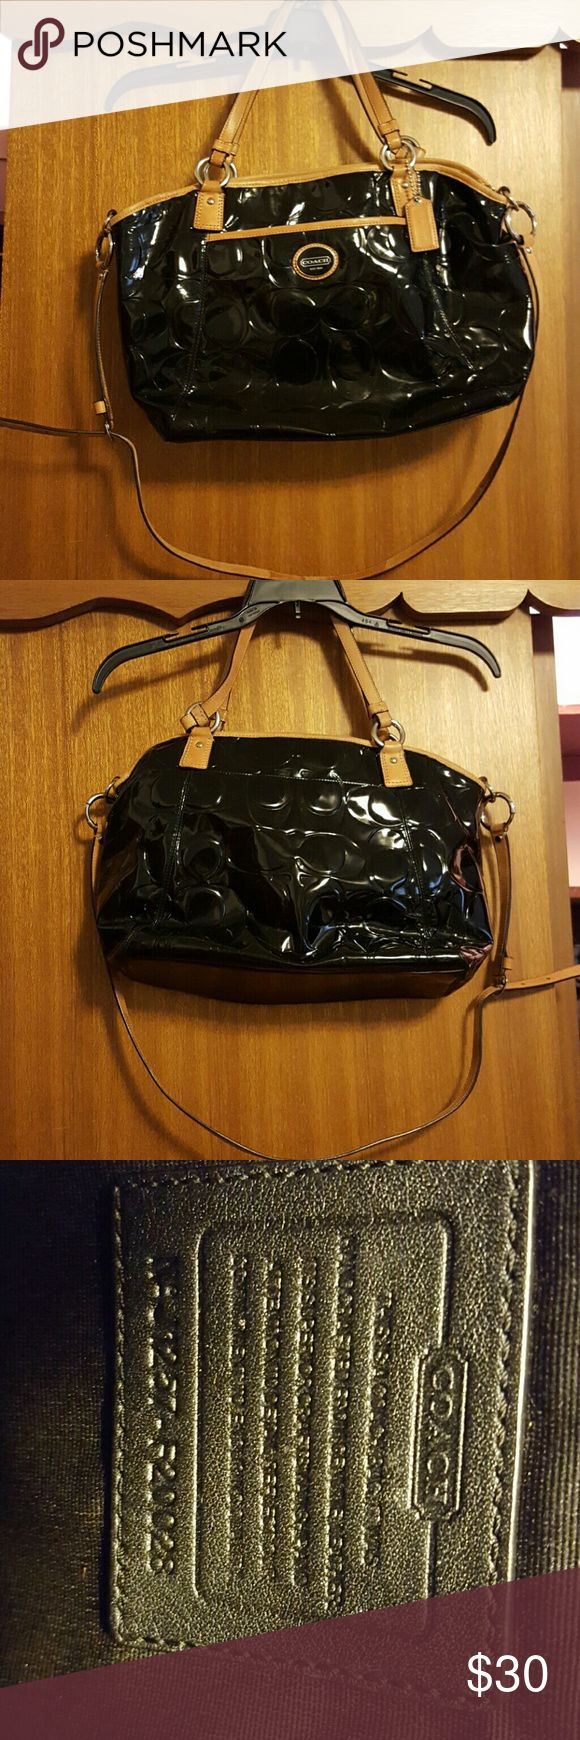 Black coach purse Black and tan coach purse Coach Bags Shoulder Bags